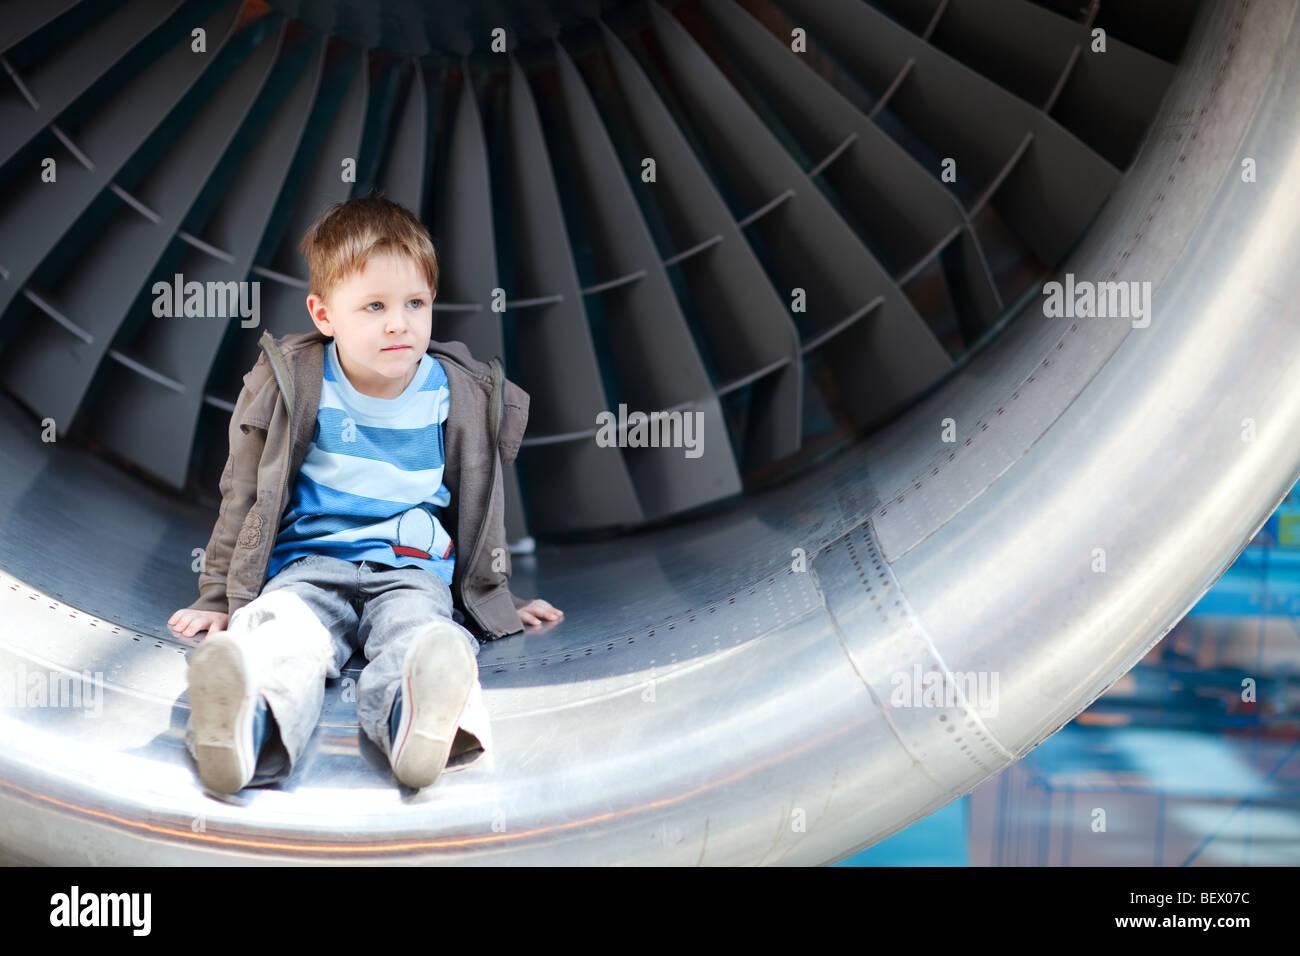 Boy sitting inside aircraft turbine - Stock Image